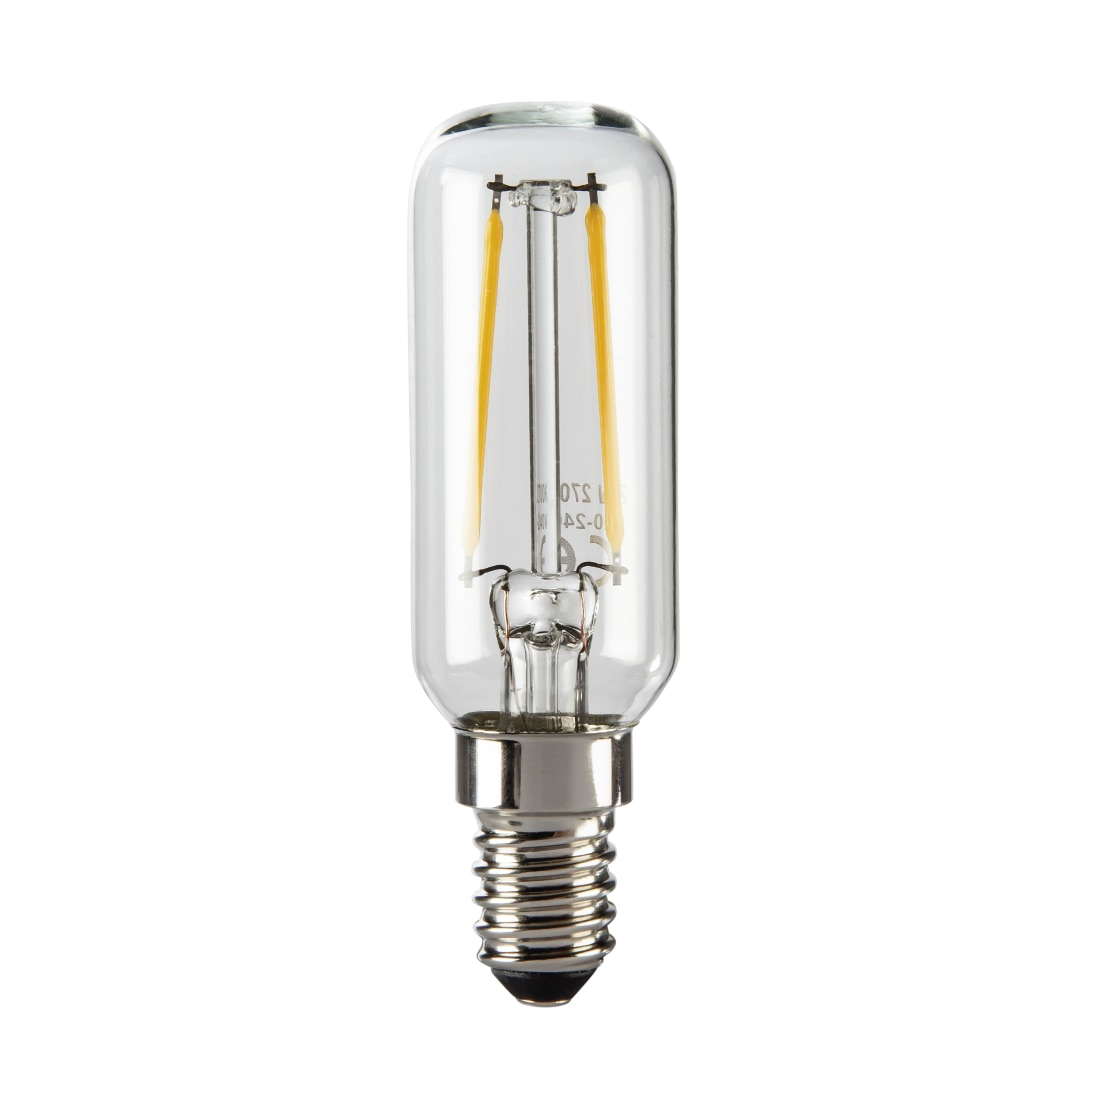 Fotografie Bec LED pentru frigidere Xavax, 2W, T25, filament, E14, lumina calda